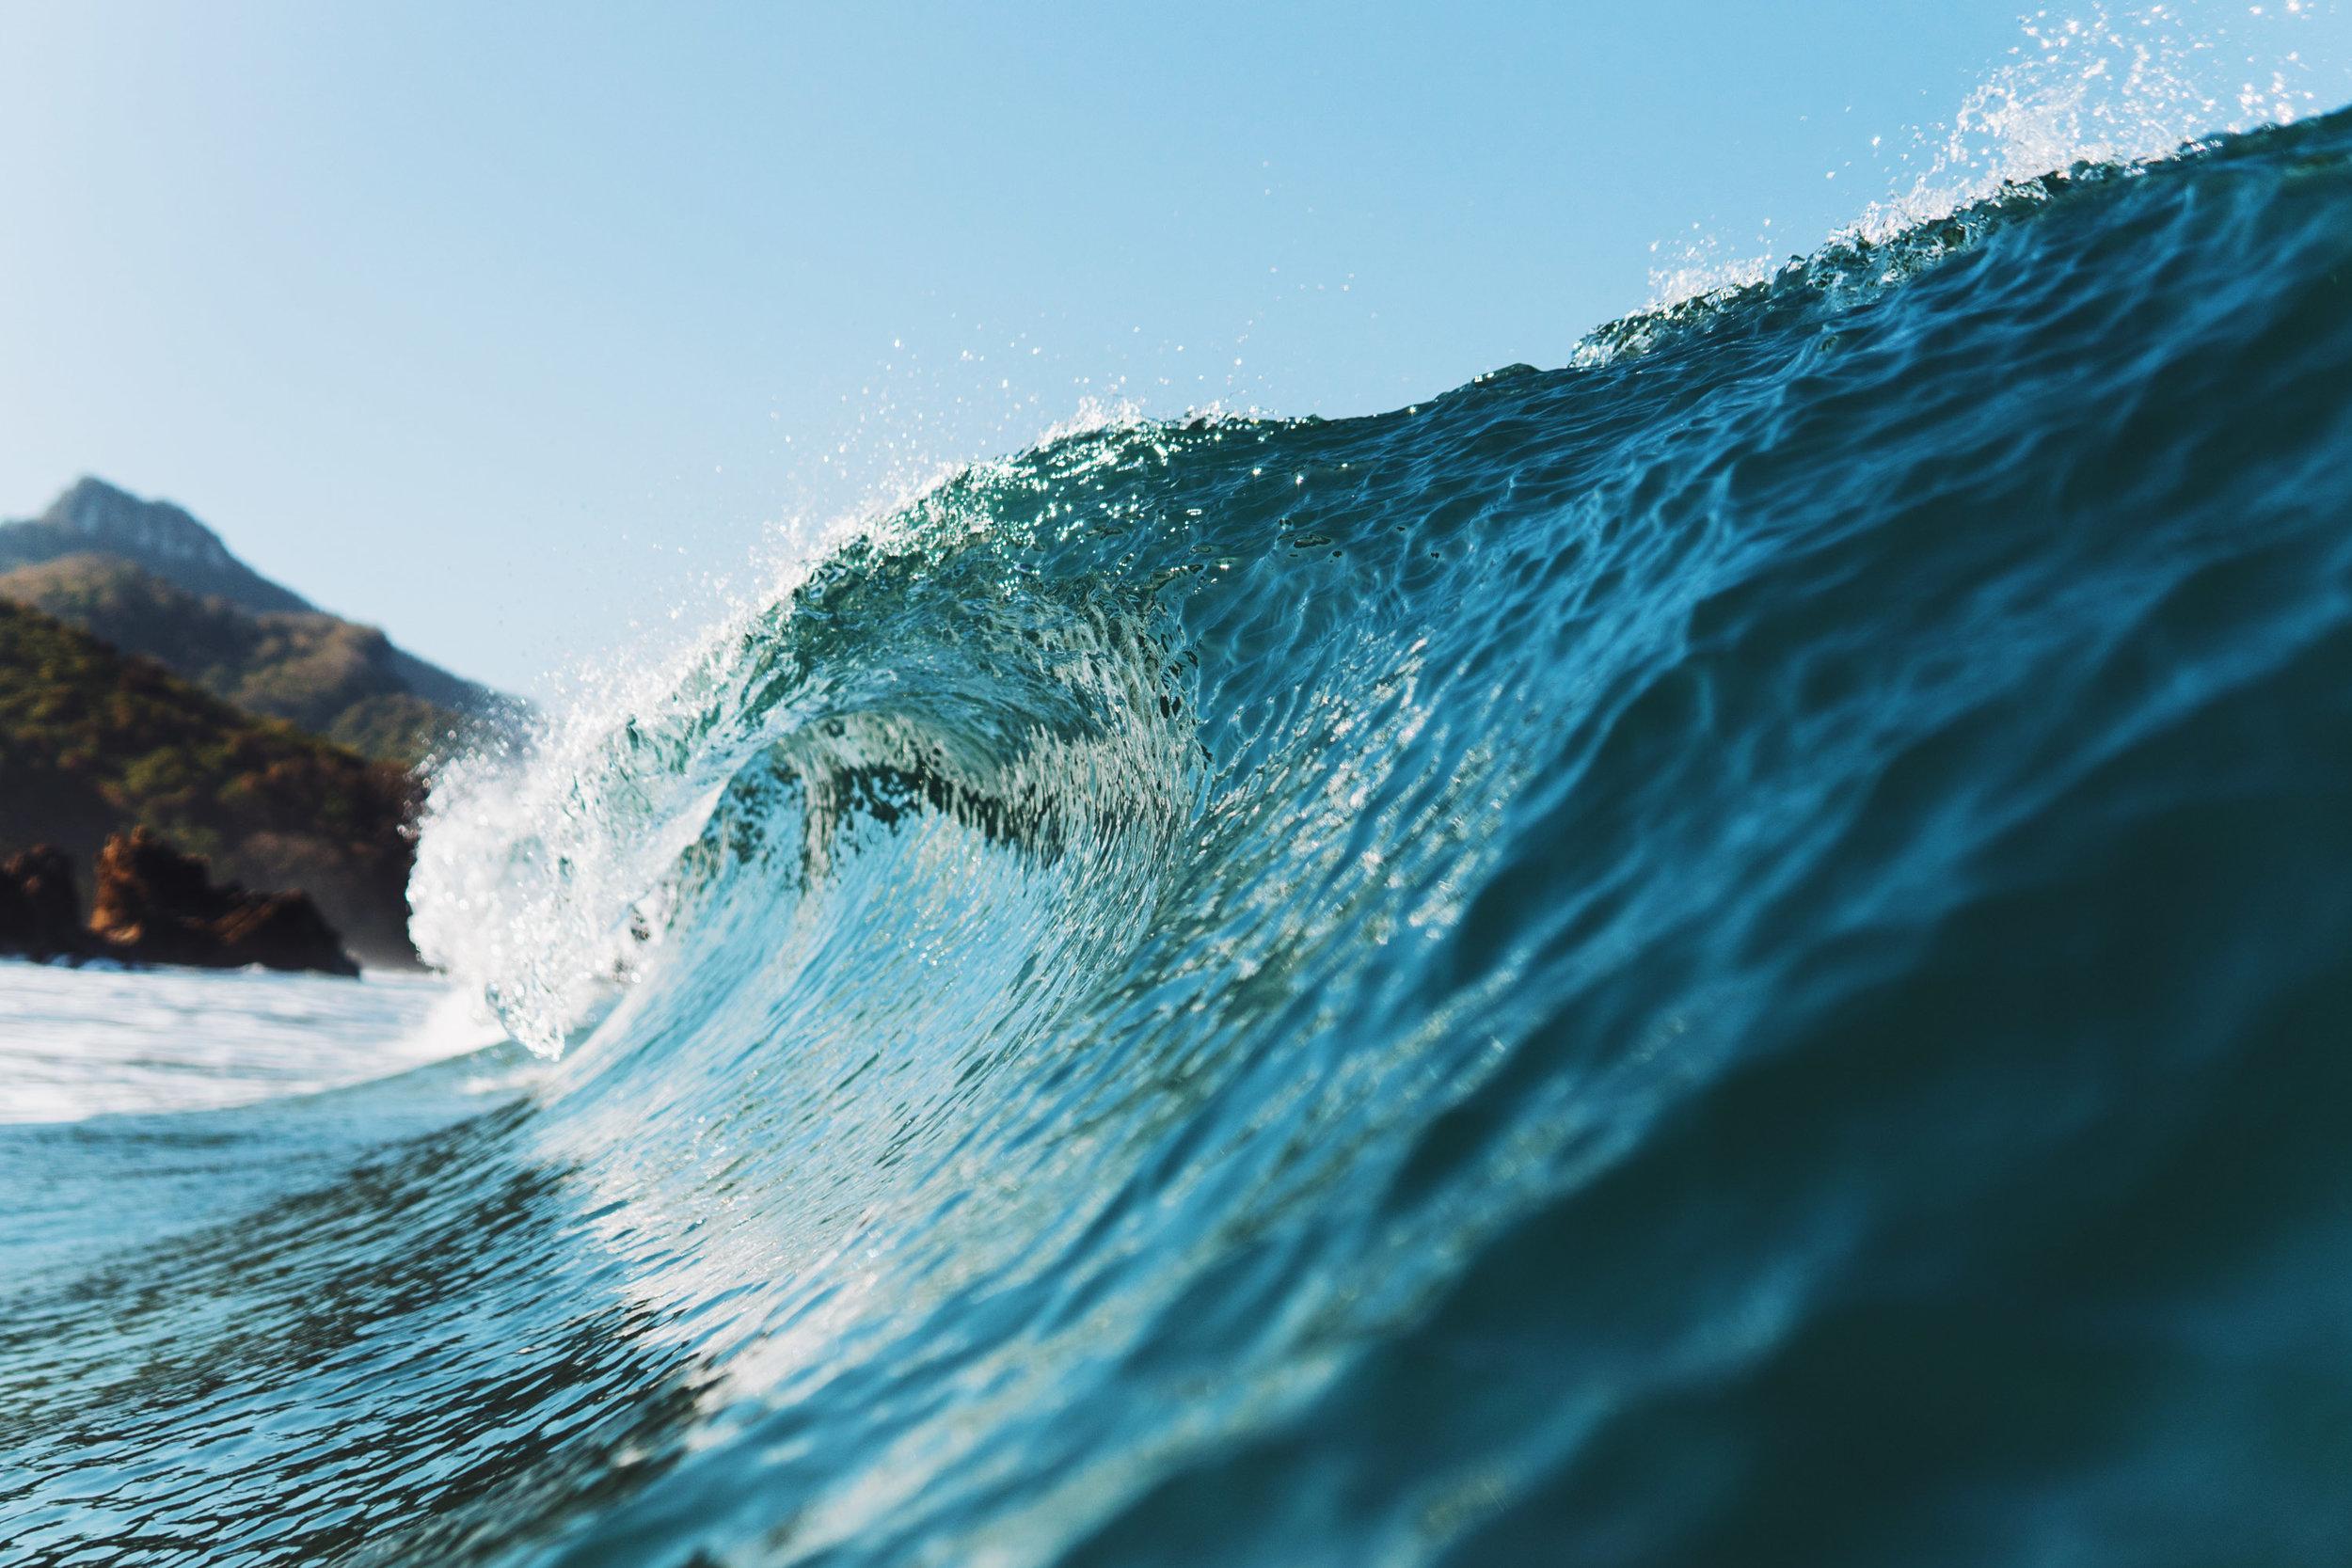 Surf-Mexico-Zihuatanejo-Sayulita-Ixtapa-Zihuatanejo-Diego-Cadena-Olas-Fotografia-Heiko-Bothe-66.jpg